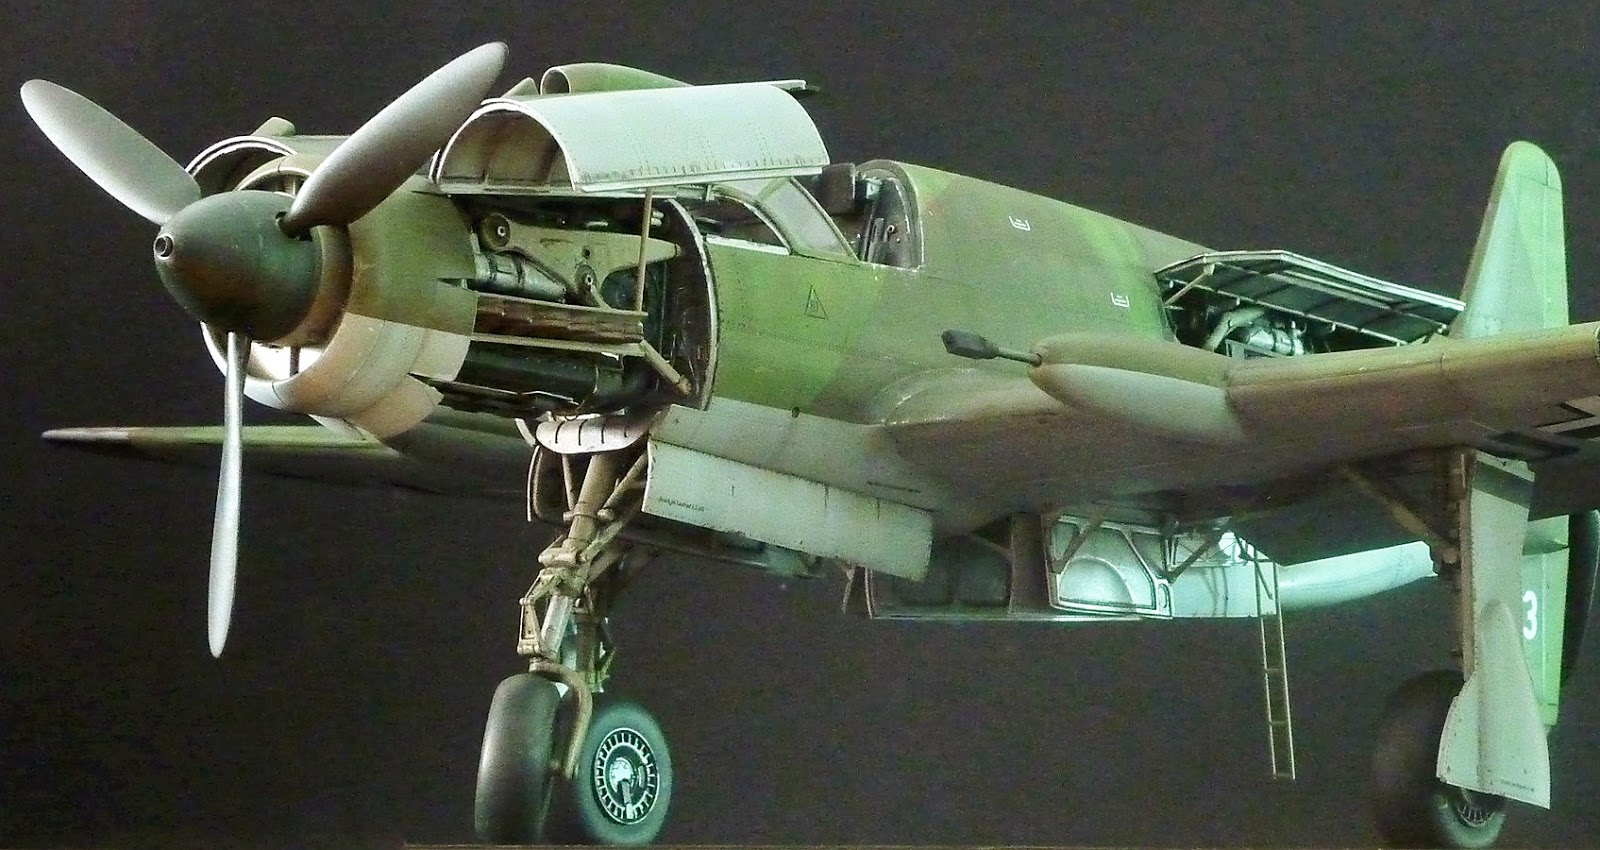 hong kong model dornier에 대한 이미지 검색결과